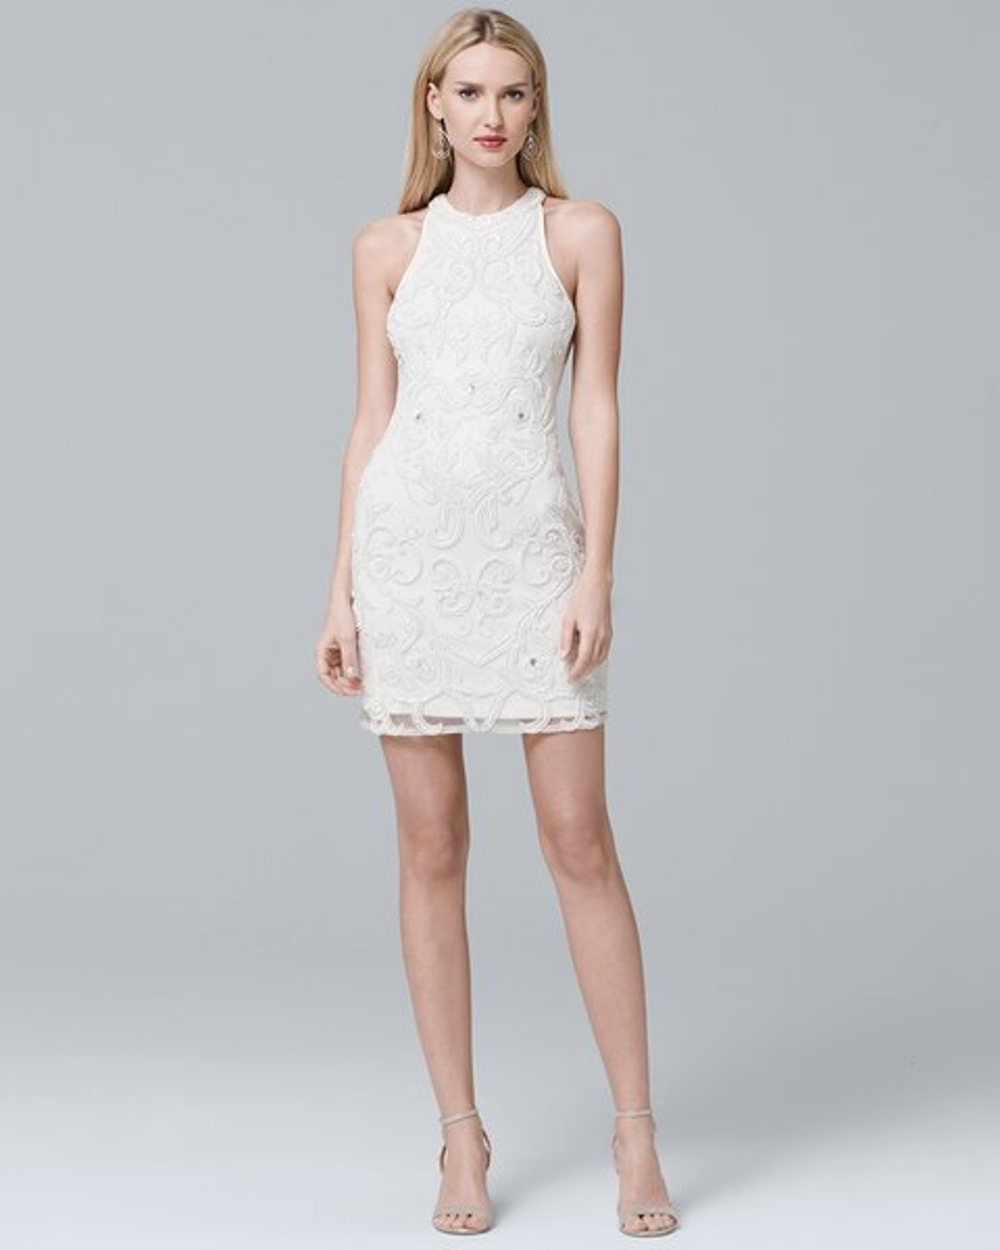 Sleeveless White Beaded Sheath Dress White House Black Market